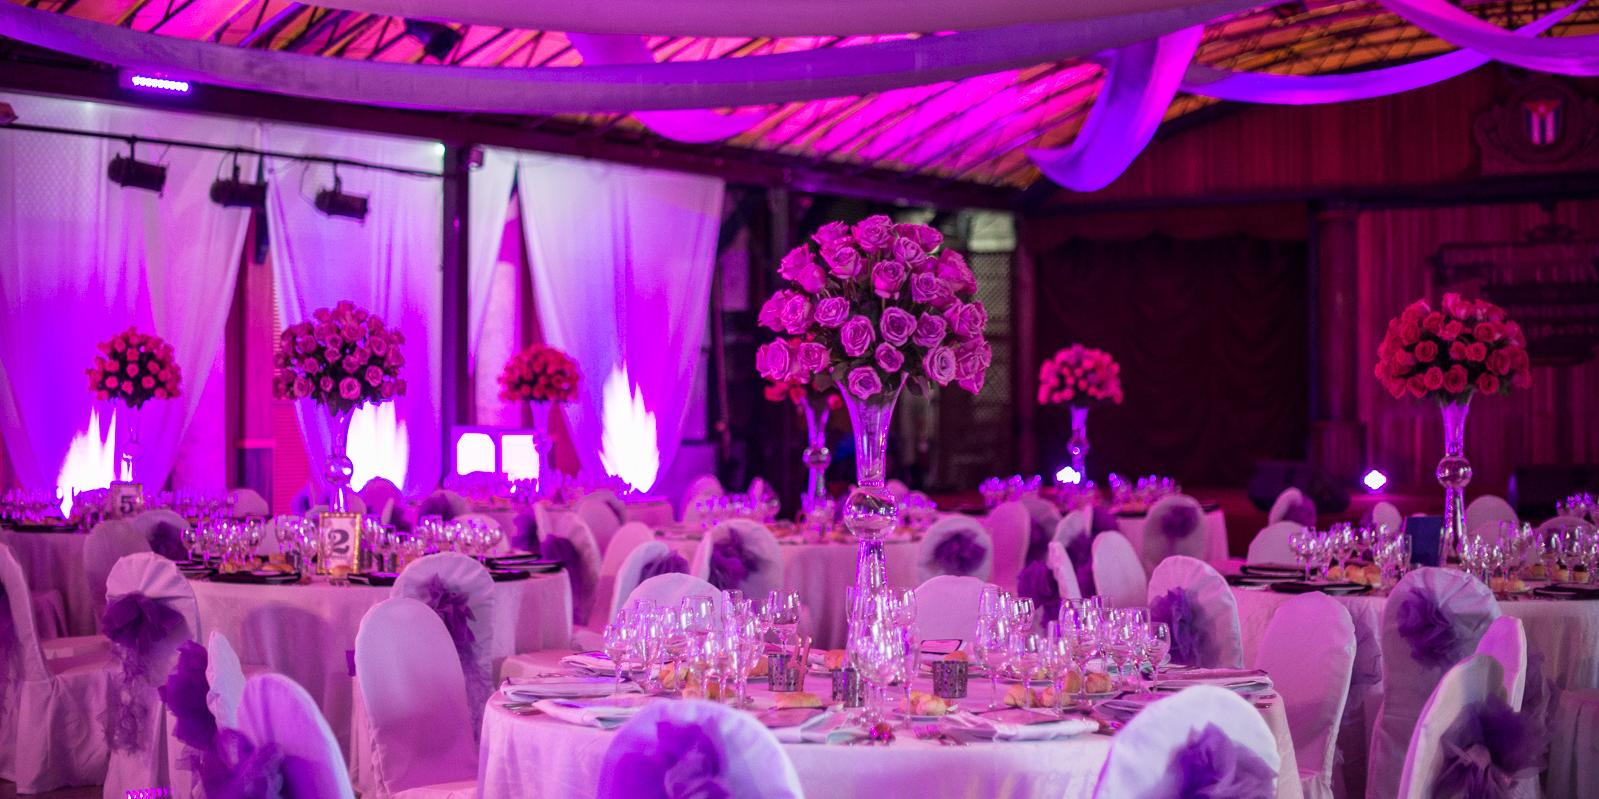 bodas-estilo-libre-jardin-cuba-9521.jpg